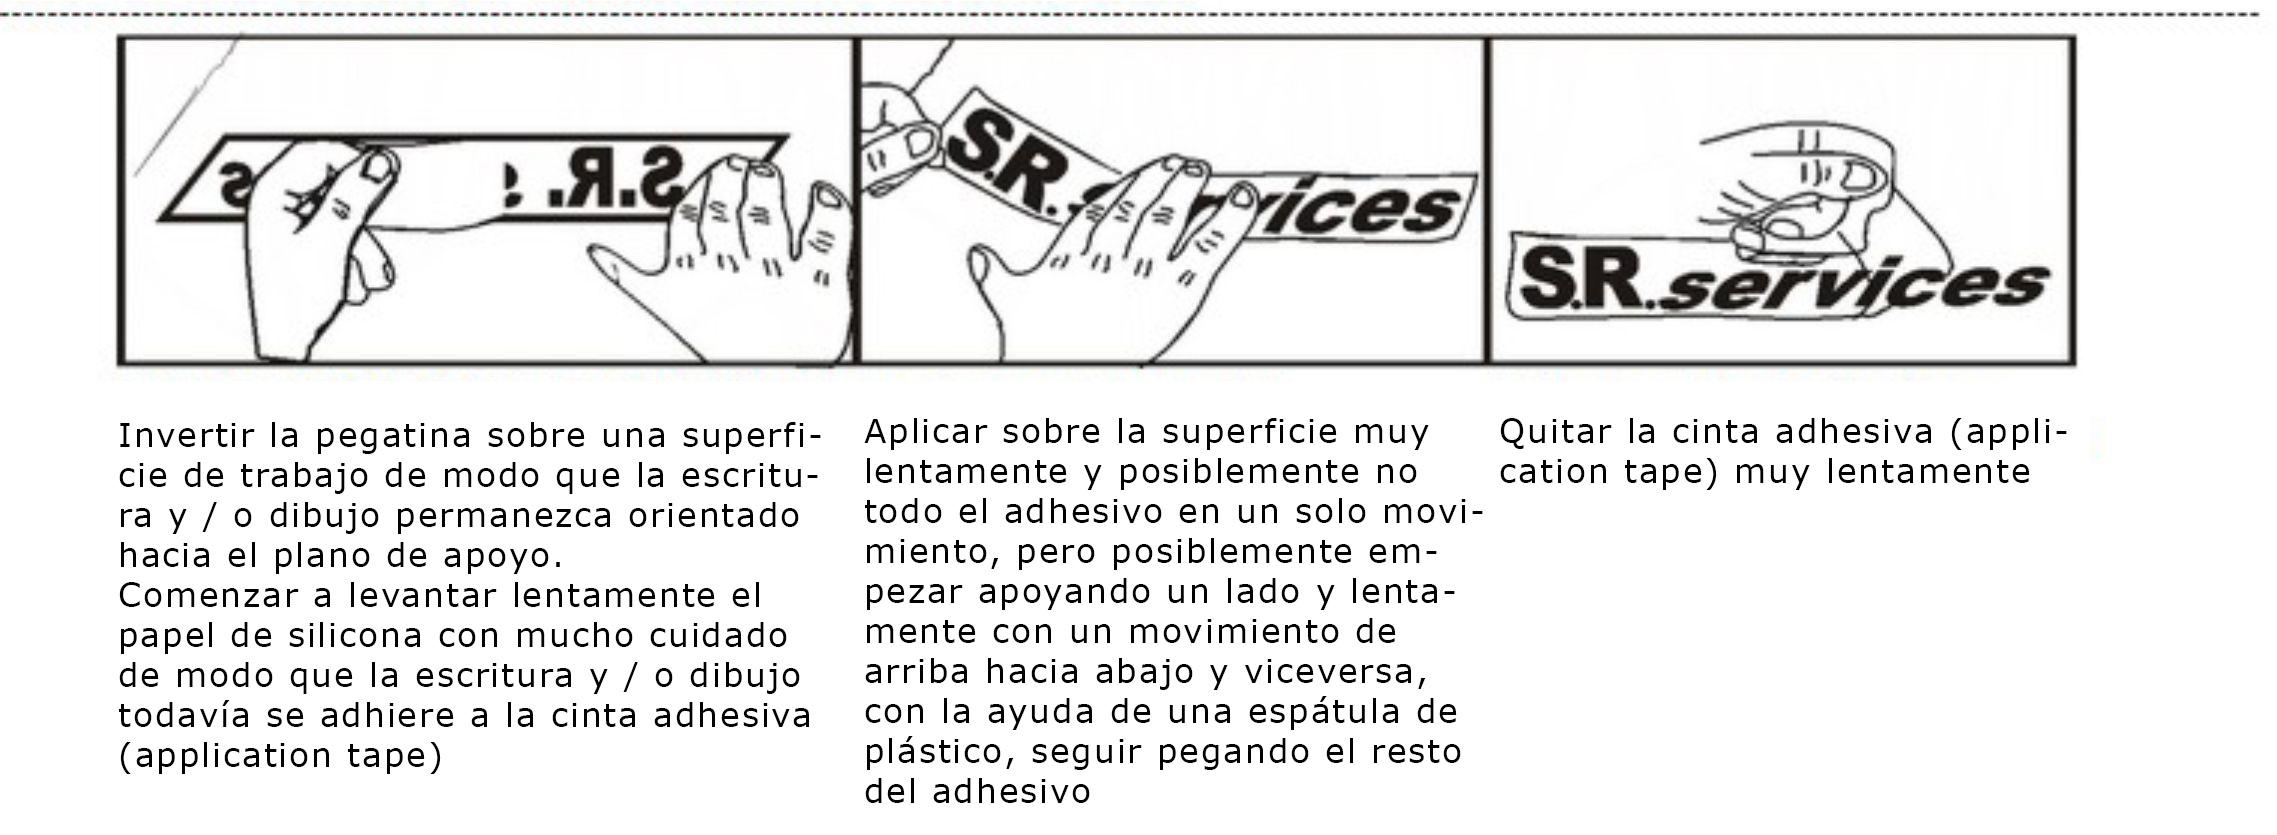 istruzioni_esp.jpg